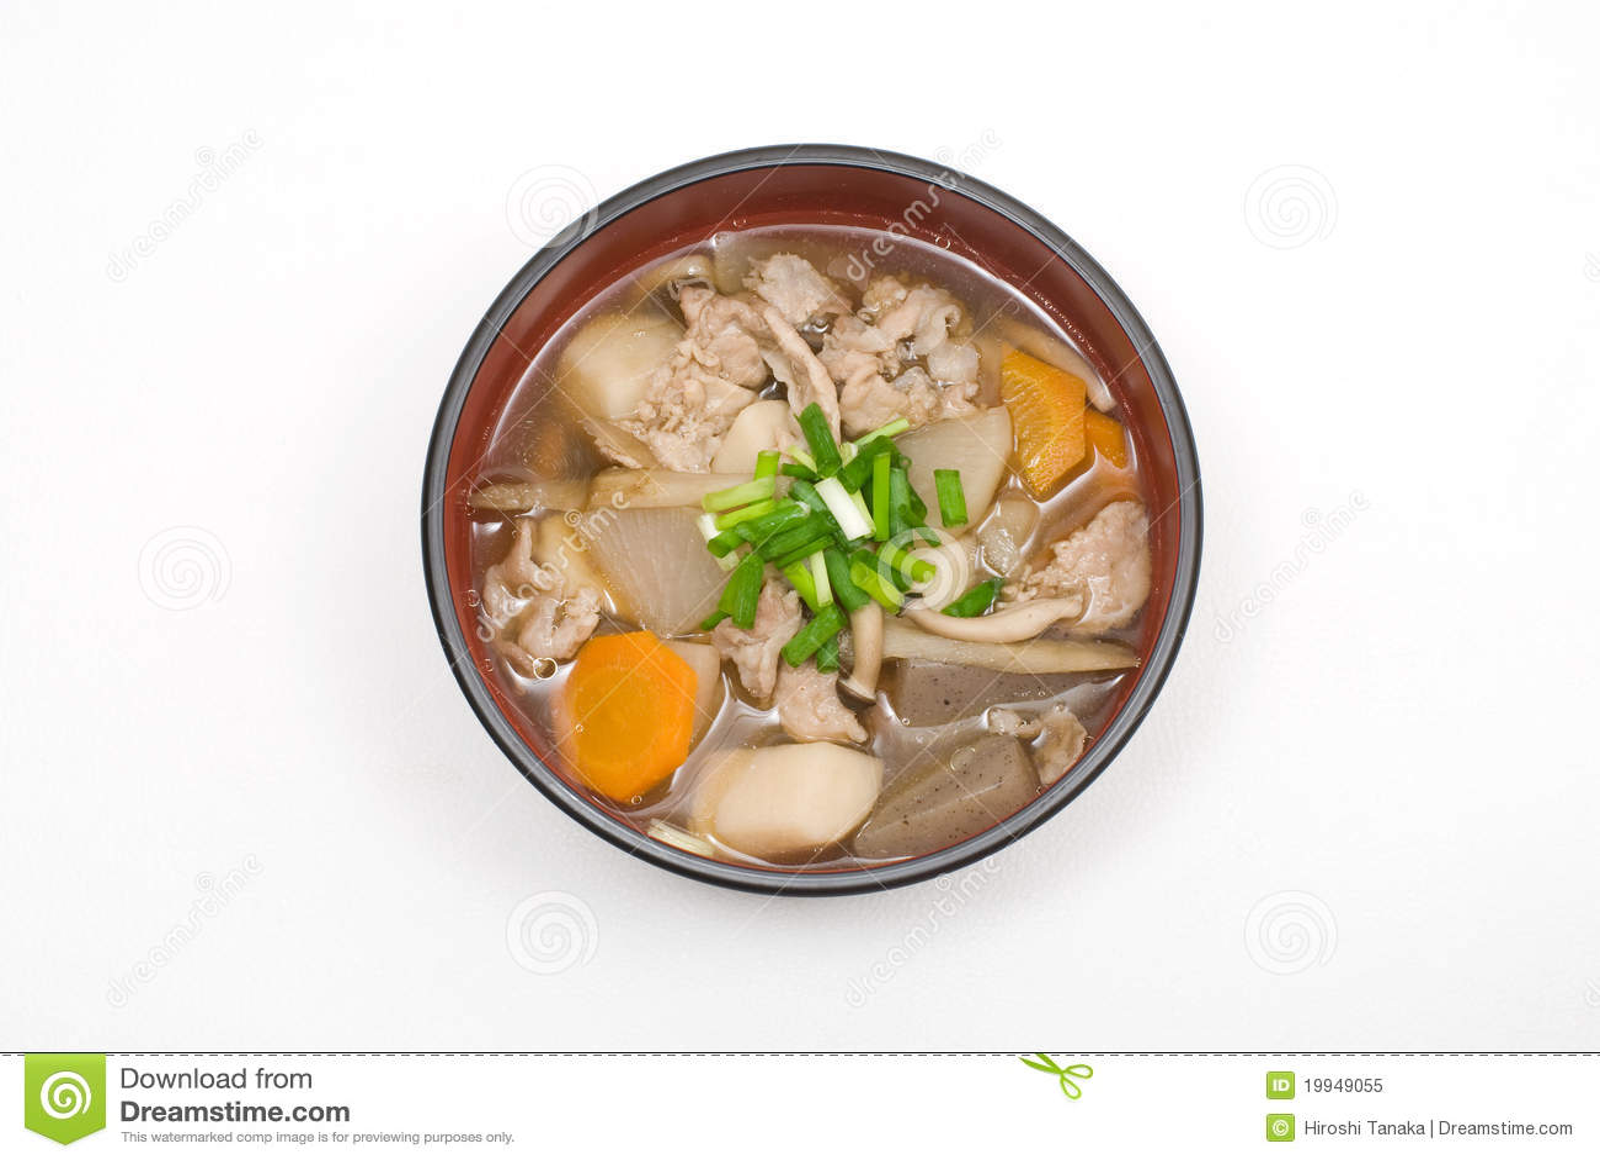 Japanese pork meat and vesitable soup named Tonjiru.